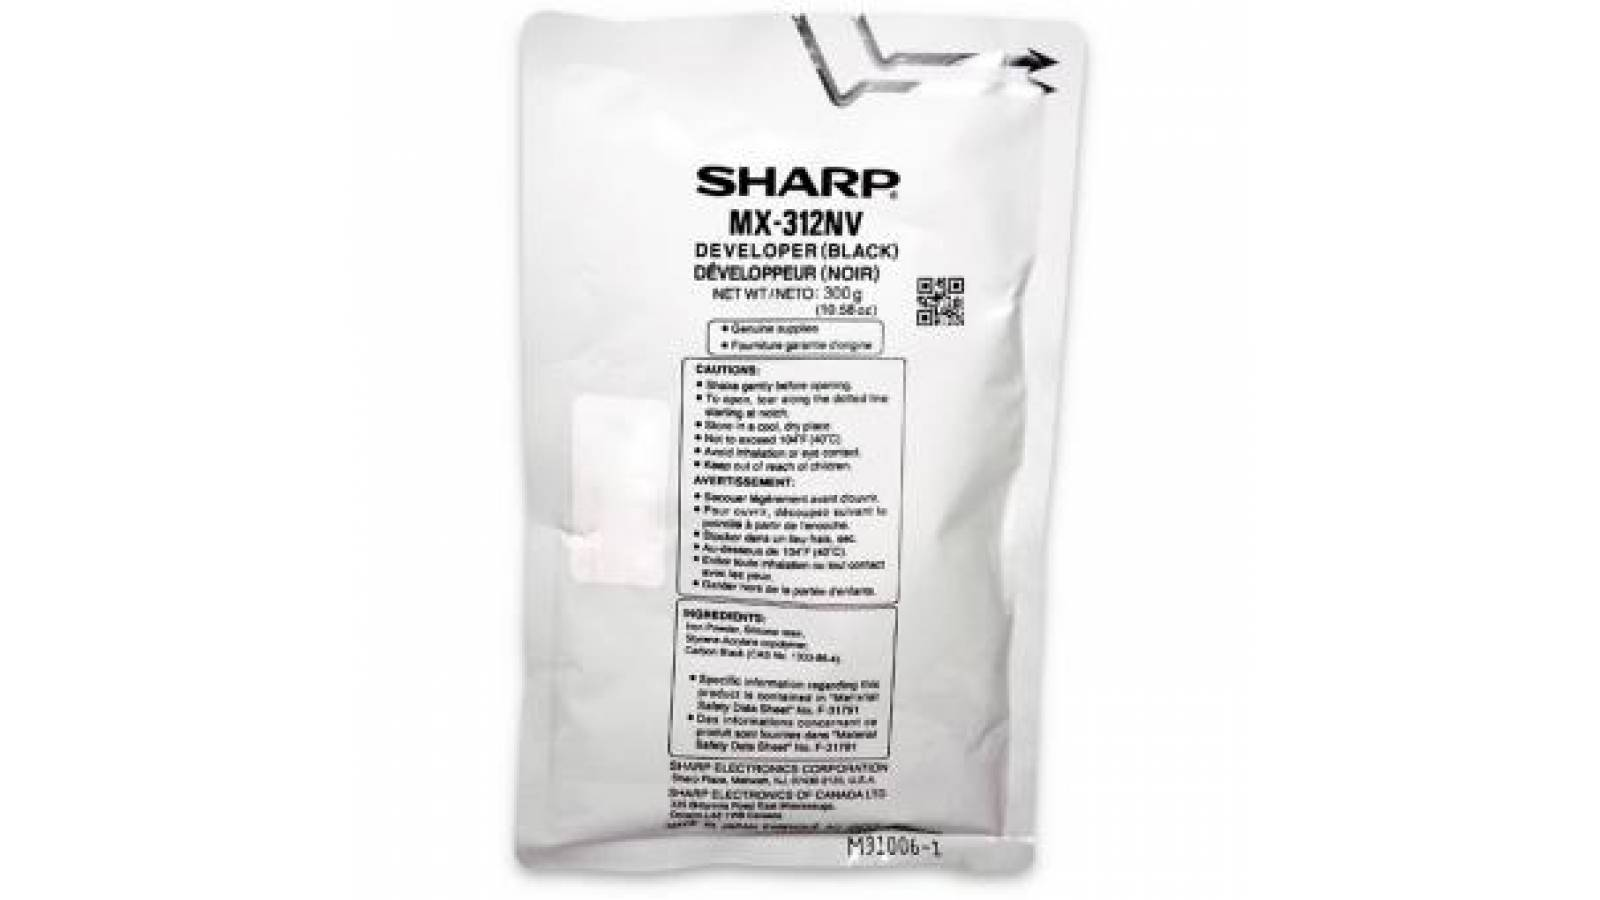 Revelador SHARP - MX-264N  MX-M260  MX-M310  MX-M314N  MX-M3